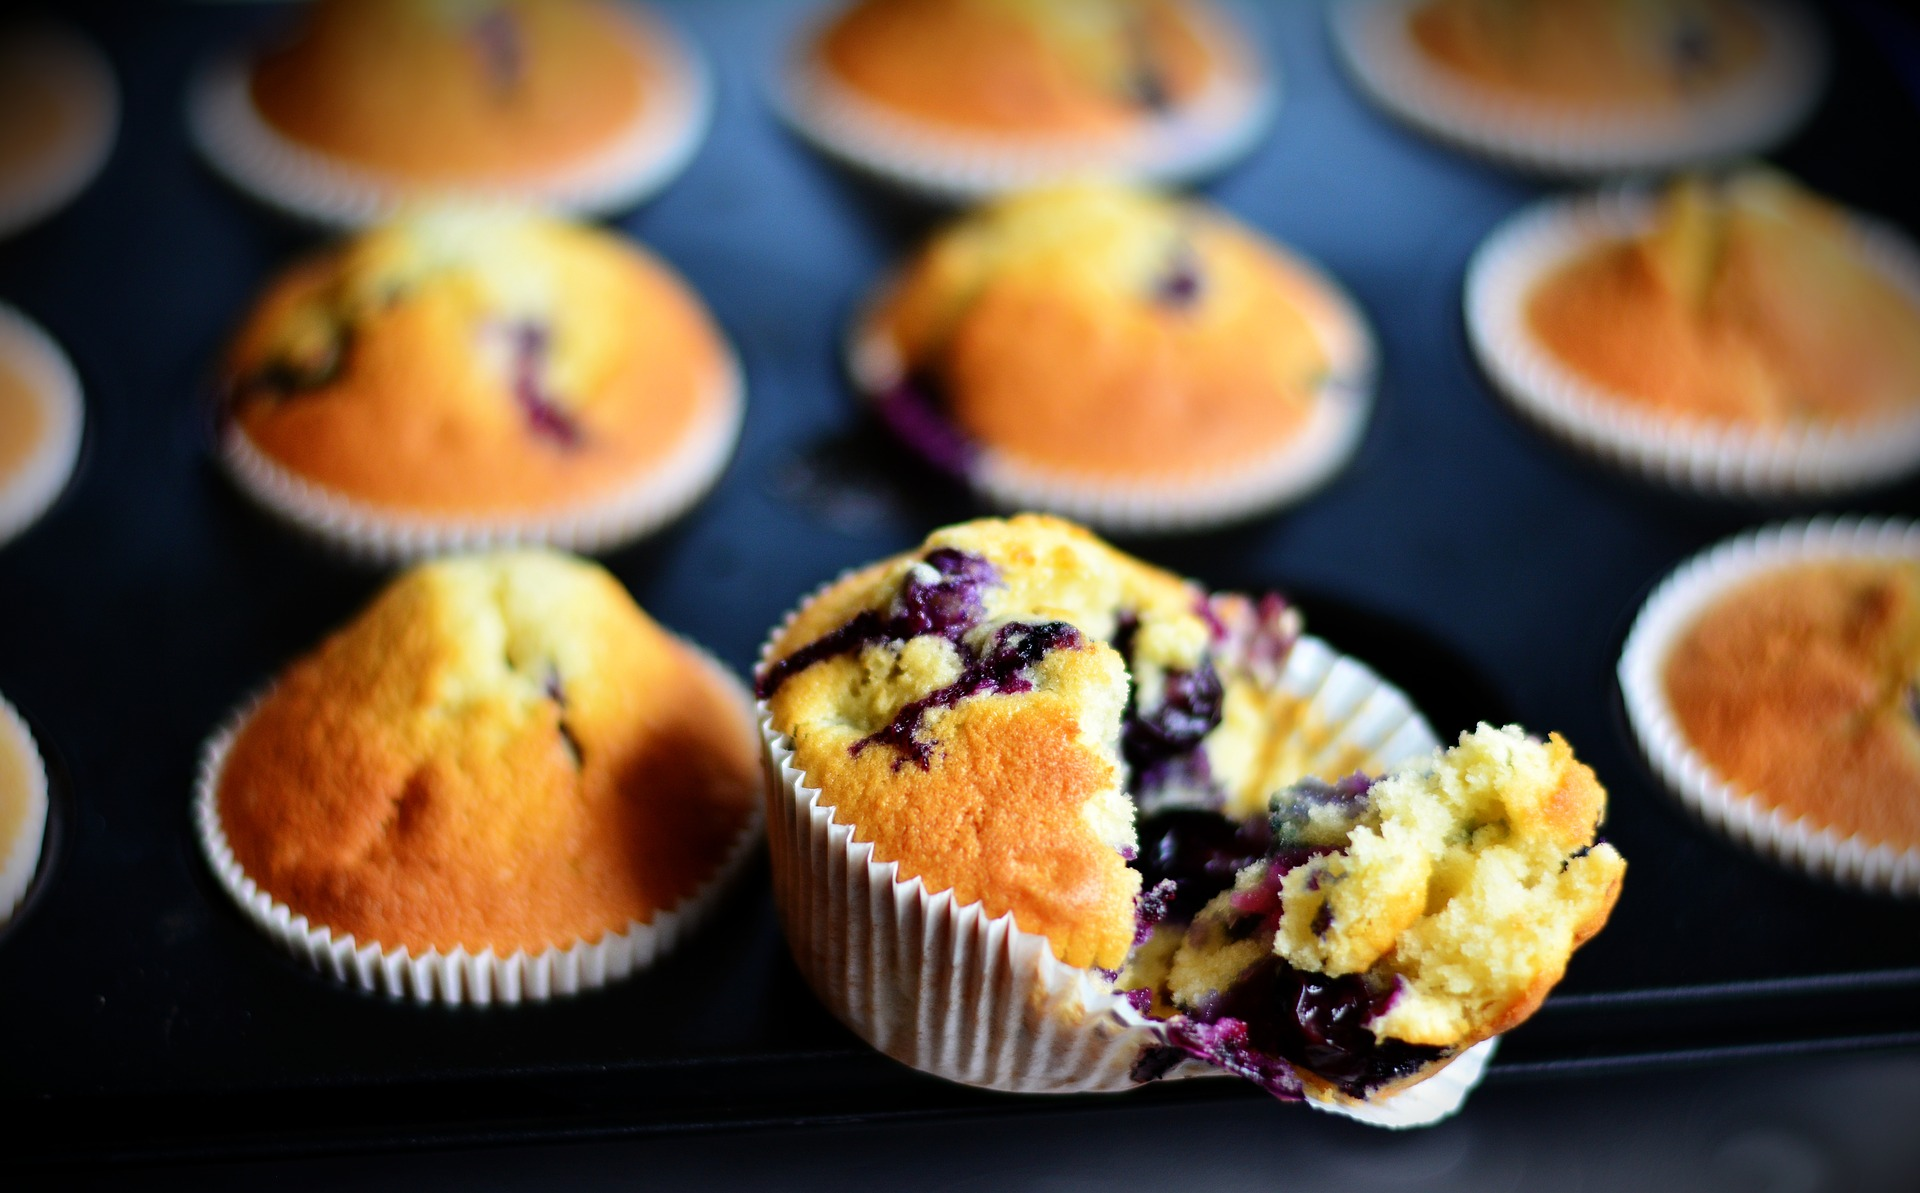 muffins-3370959_1920.jpg